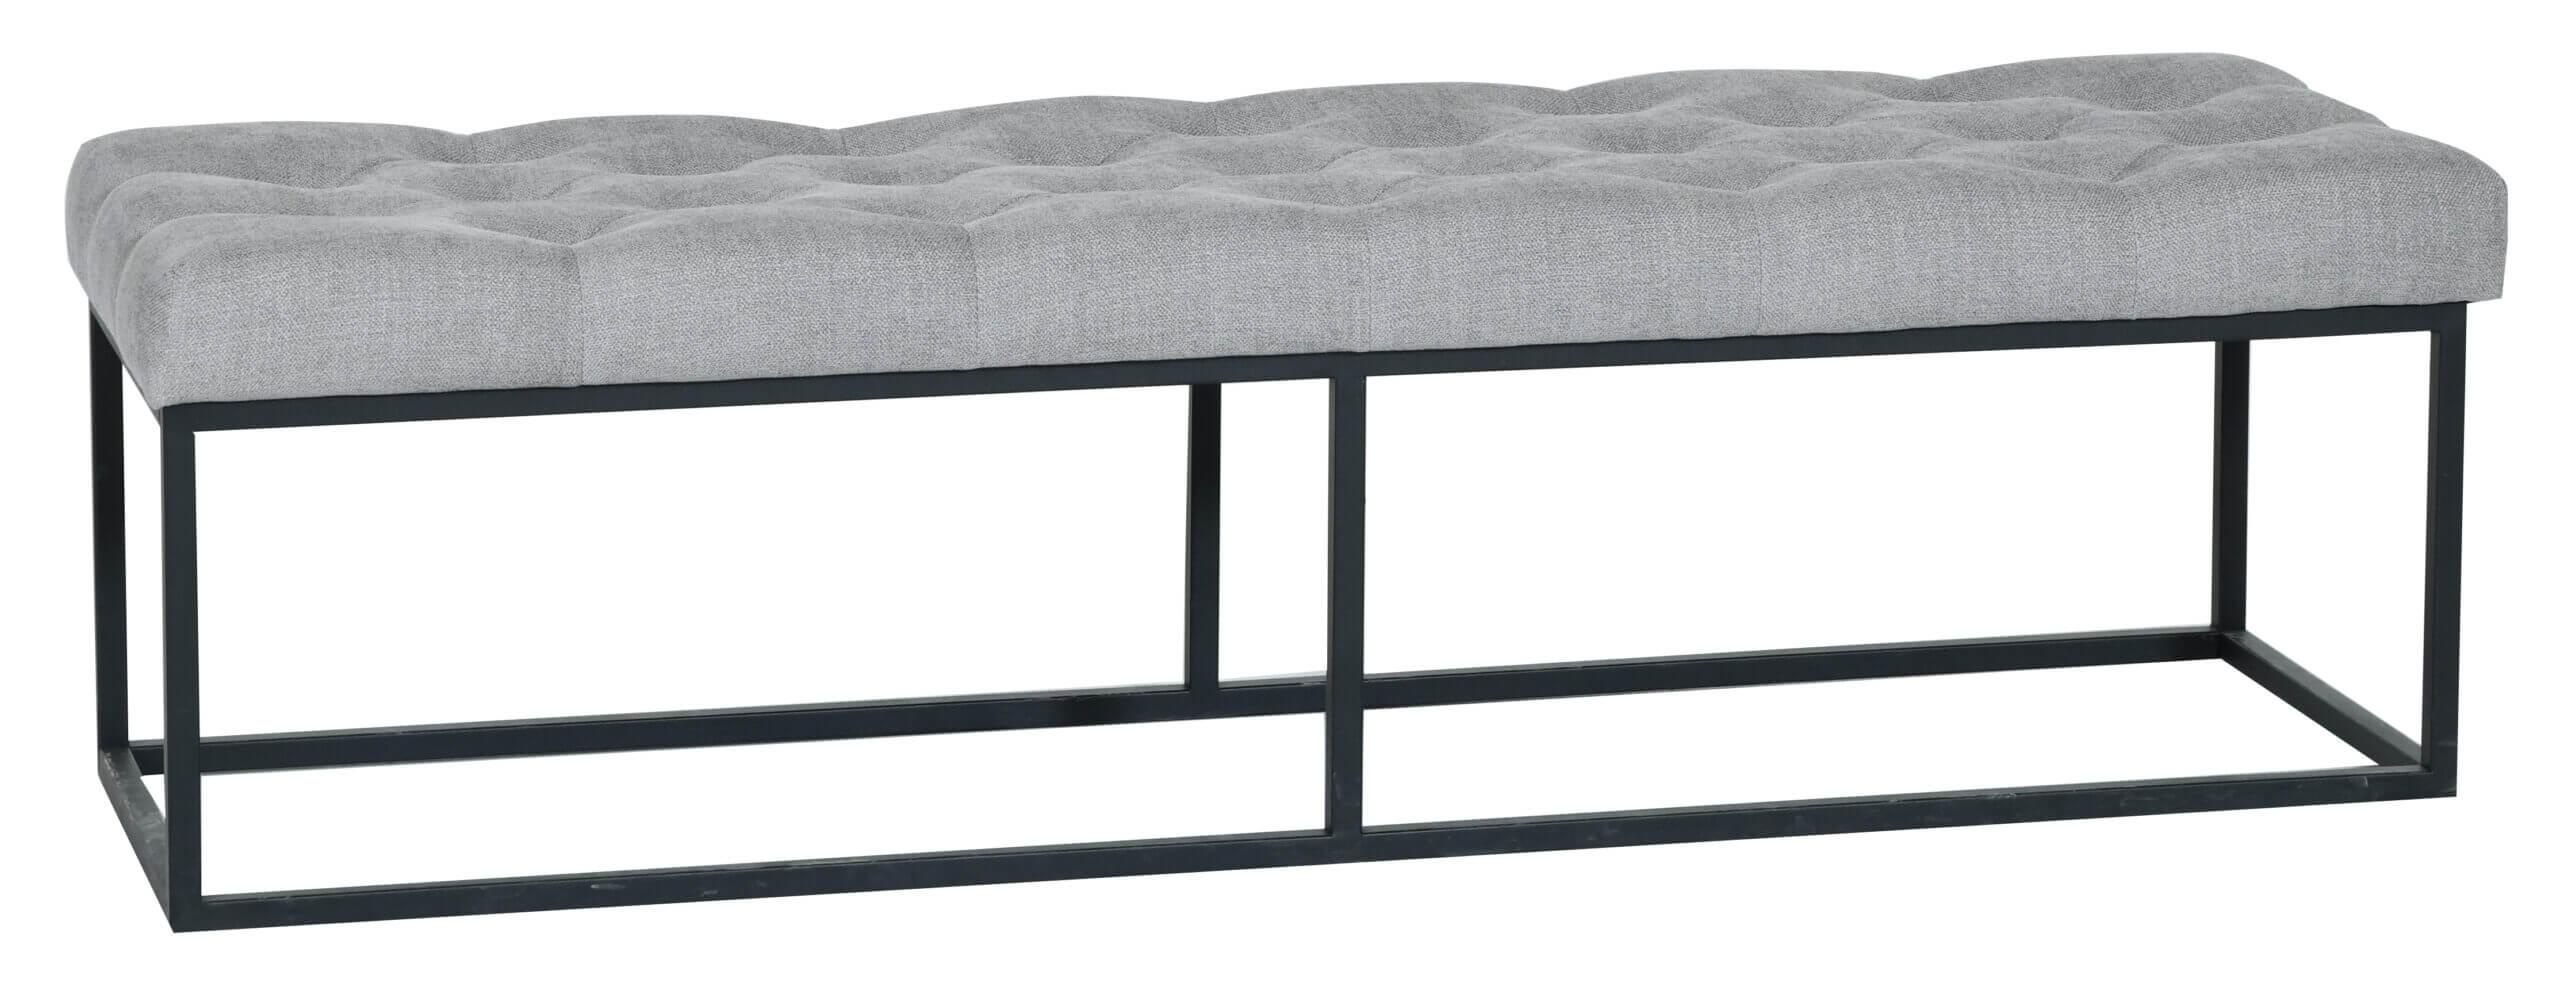 Bed Stool Light Grey Jy666 24 Malloupas Amp Papacostas